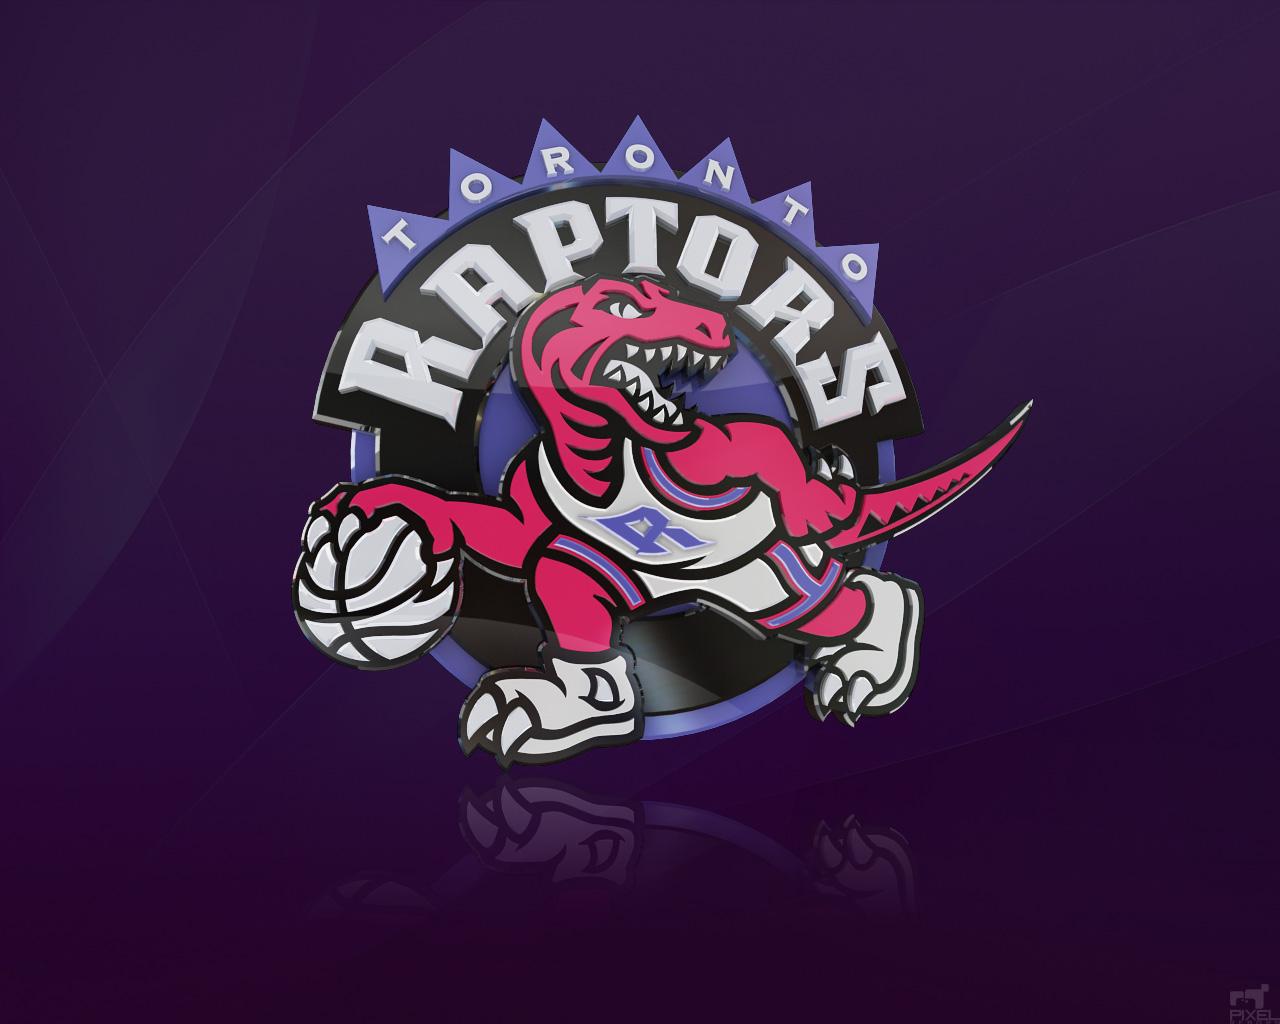 https://i0.wp.com/www.itusozluk.com/image/toronto-raptors_88122.jpg